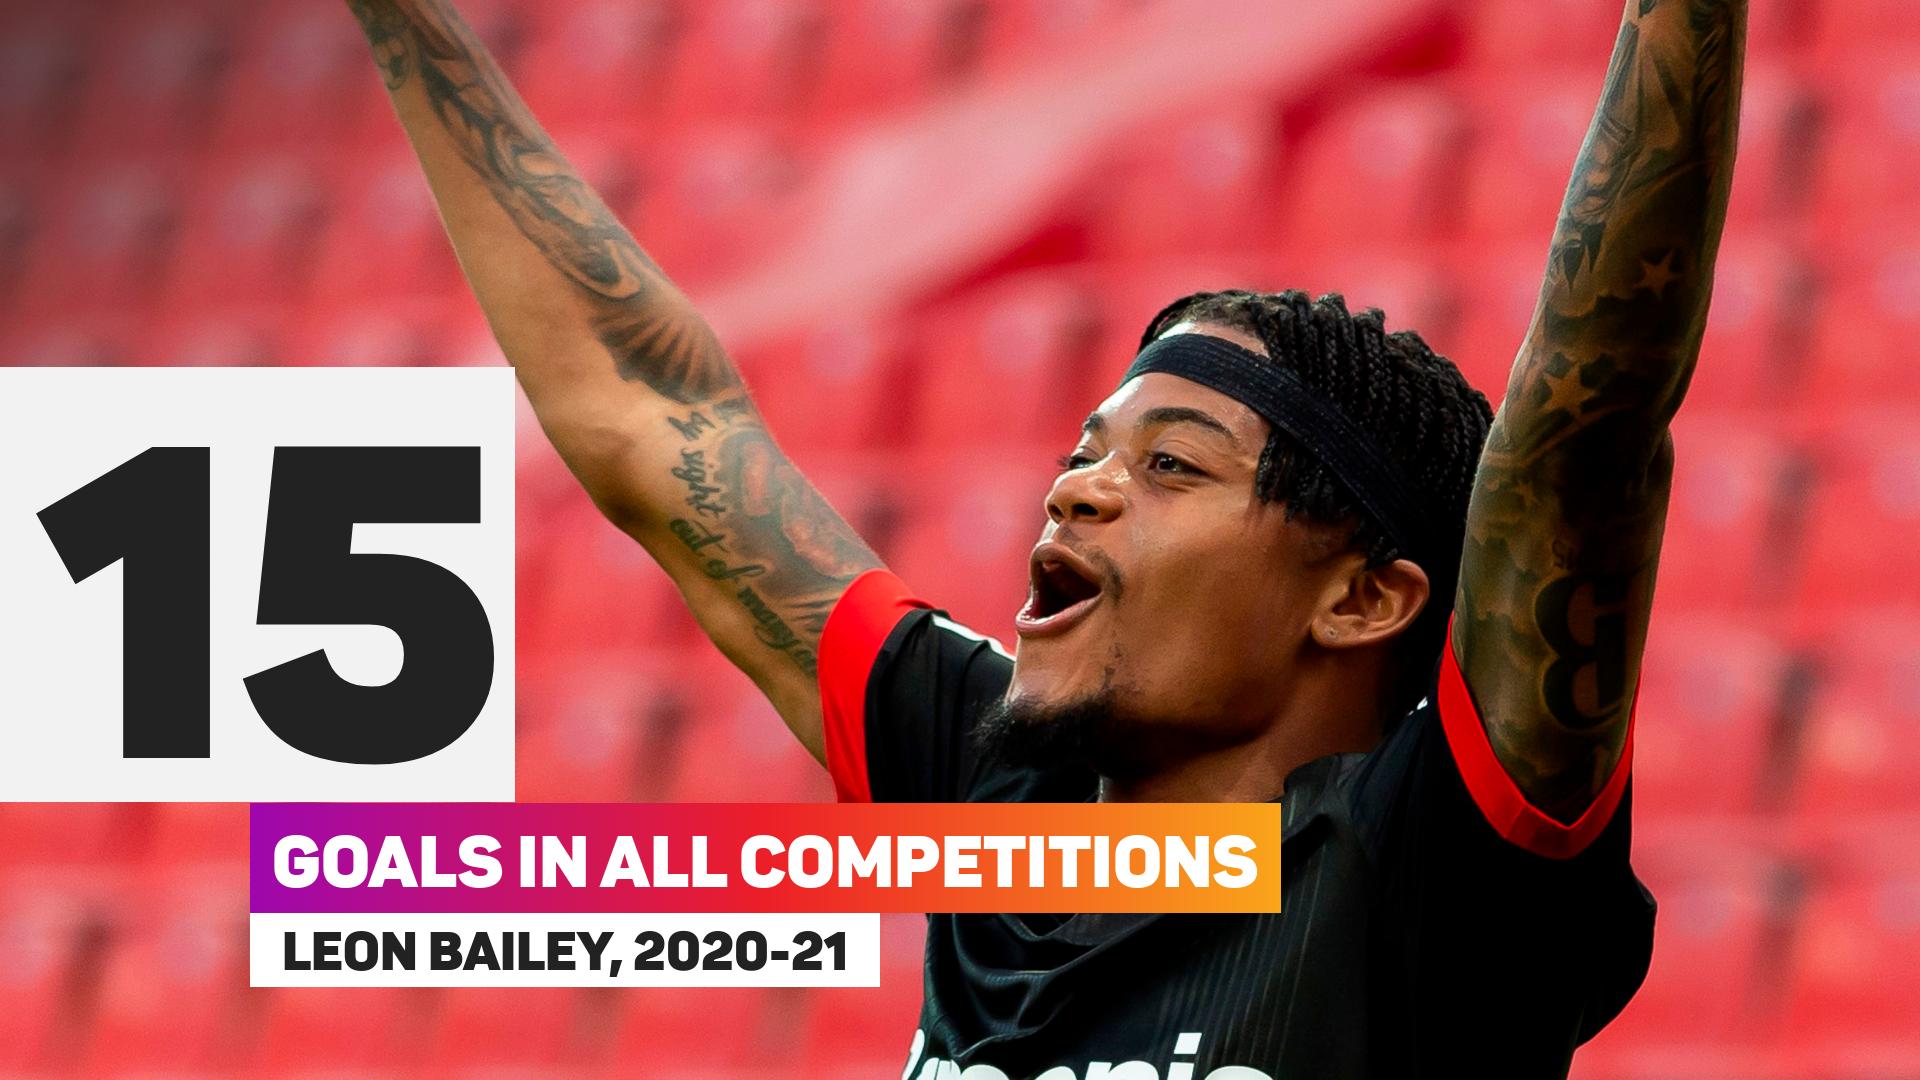 Leon Bailey excelled last season